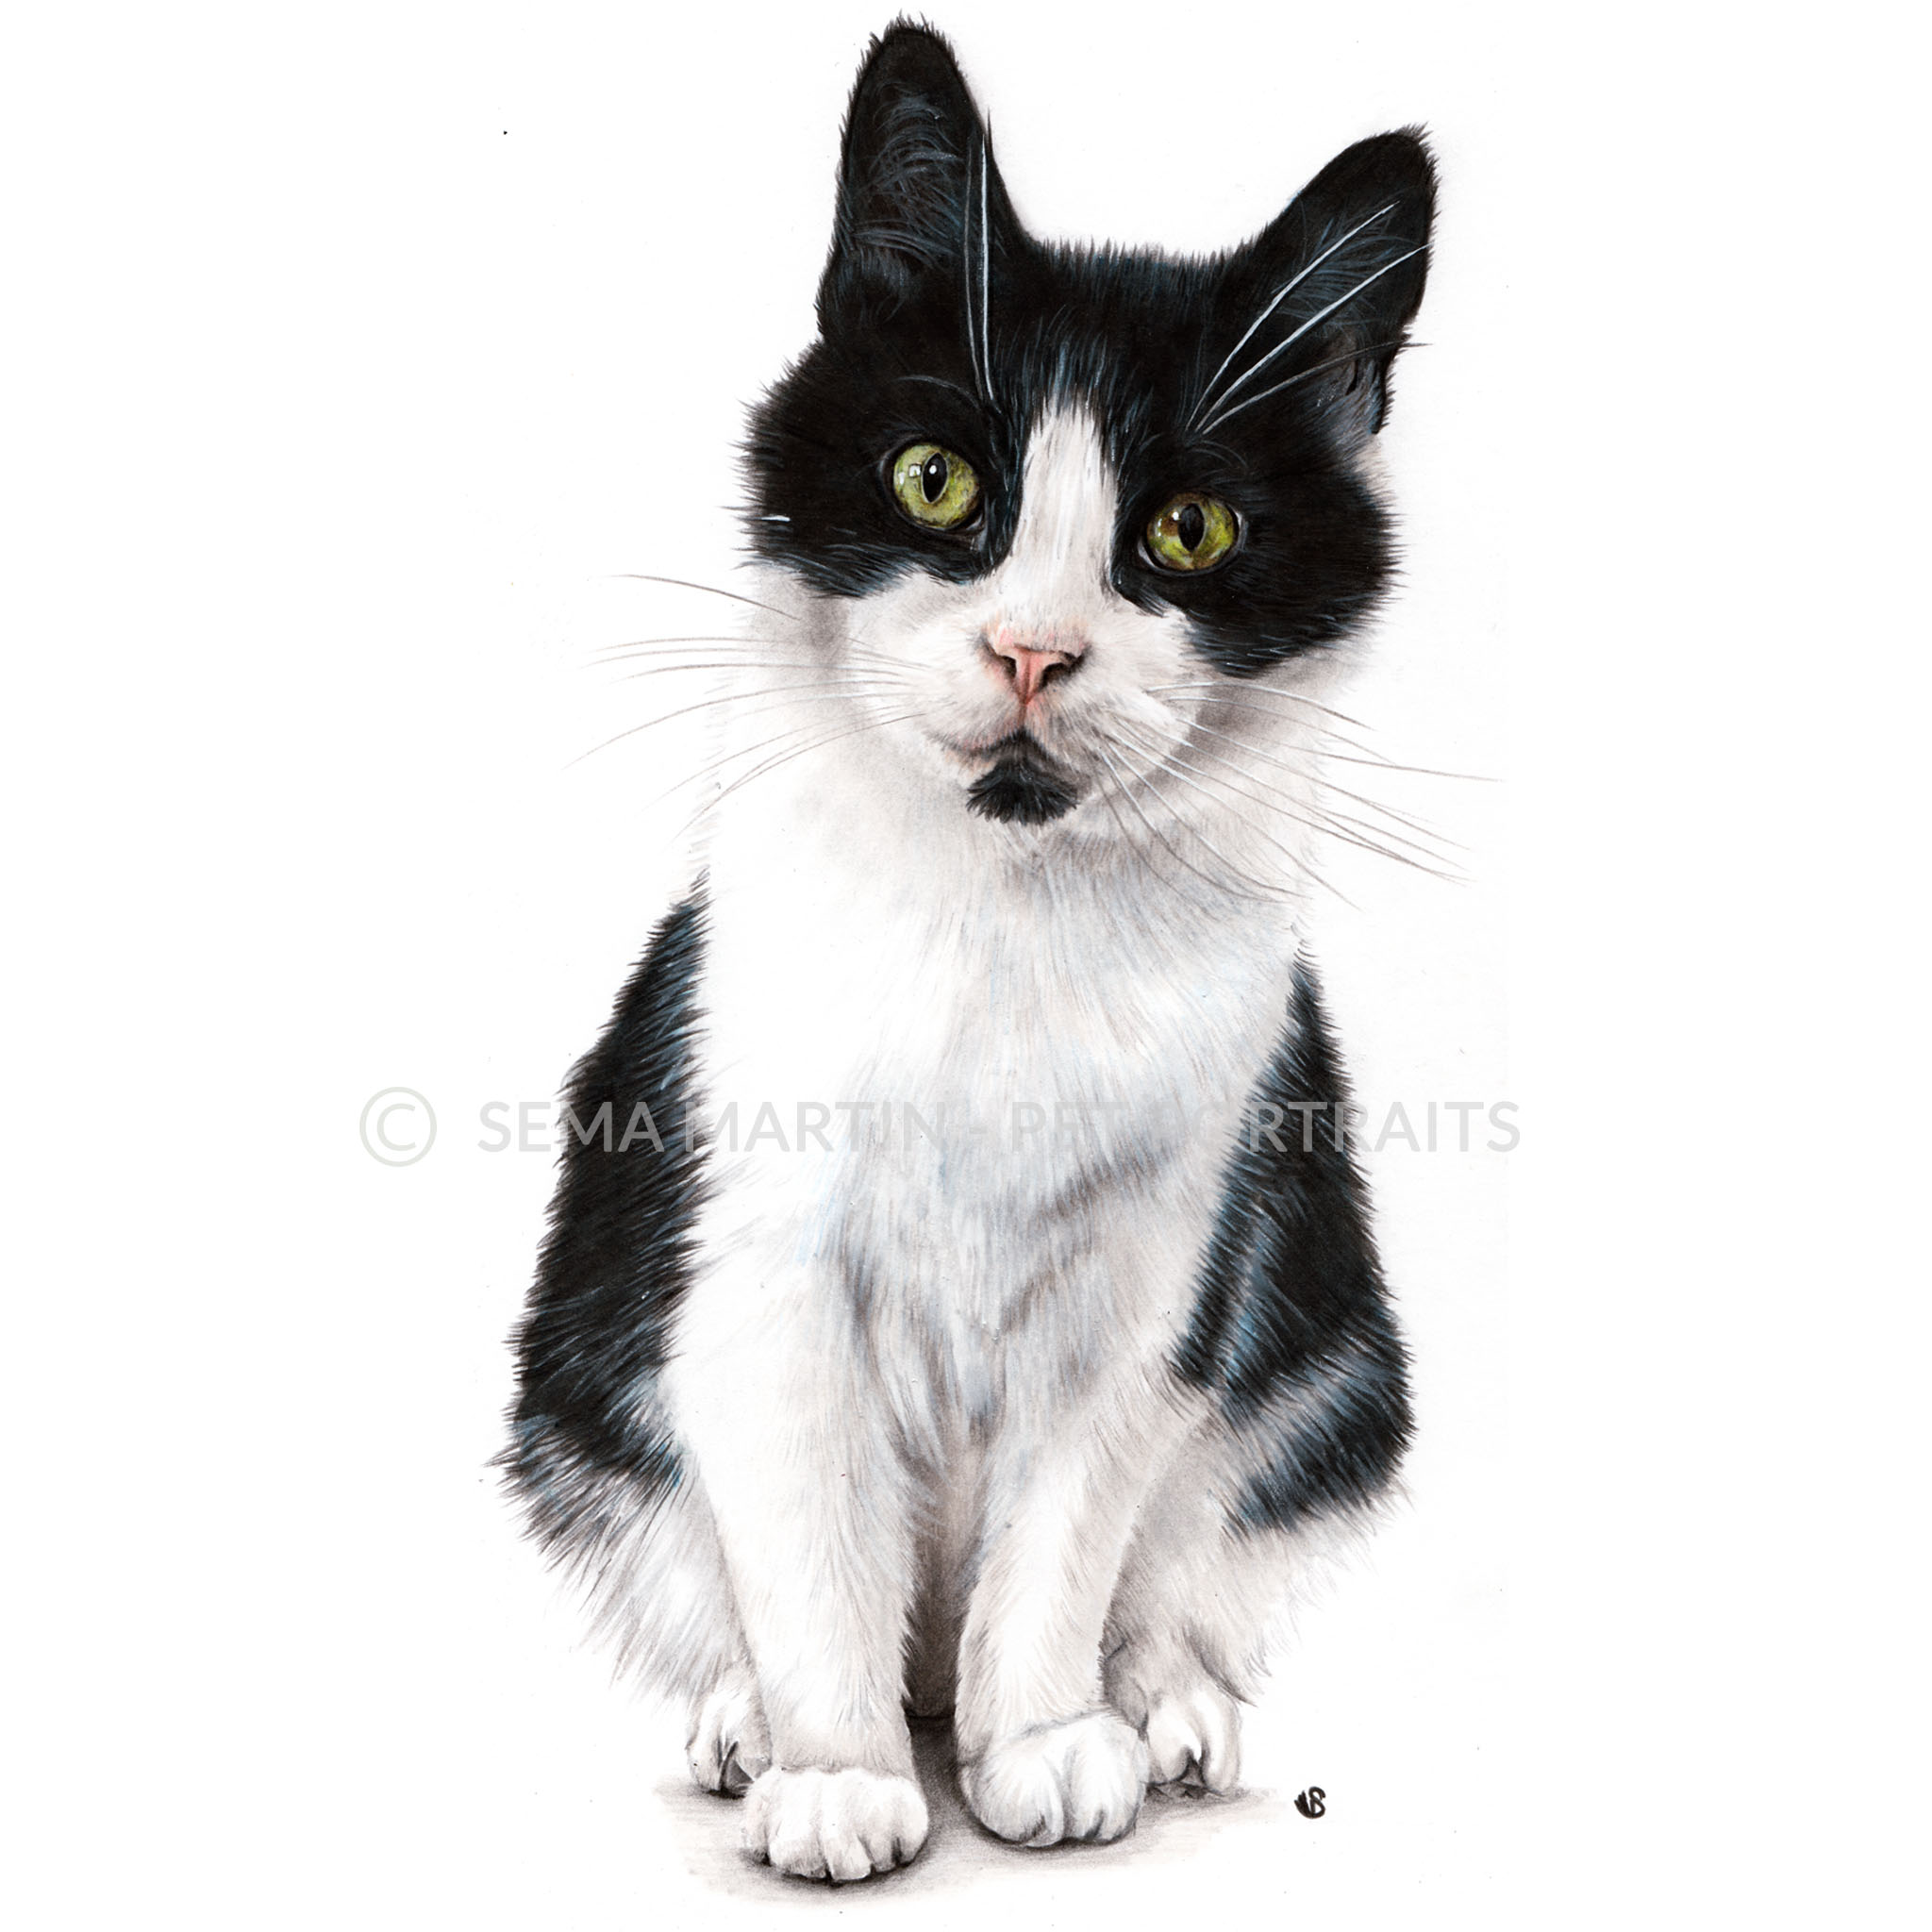 'Poppet' - UK, 8.3 x 11.7 inches, 2018, Colour Pencil Tuxedo Cat Portrait by Sema Martin